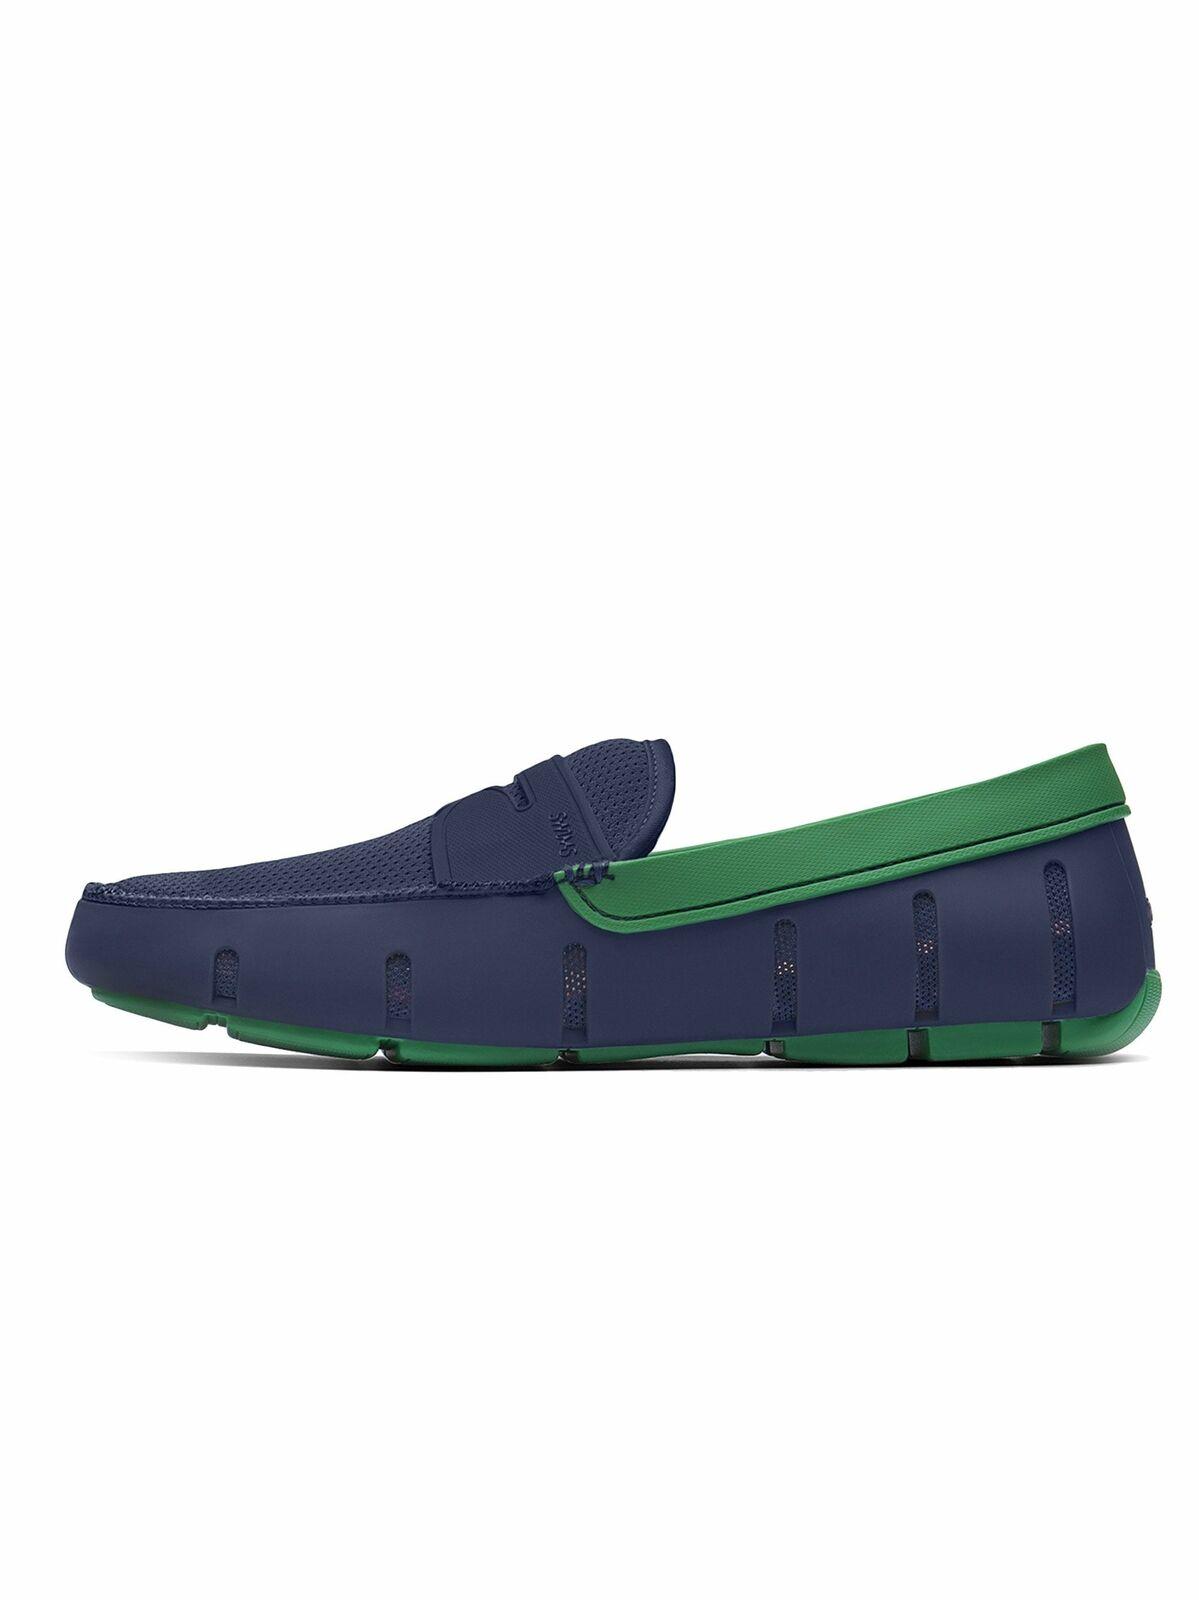 Swims Navy & Jolly verde Penny Loafer